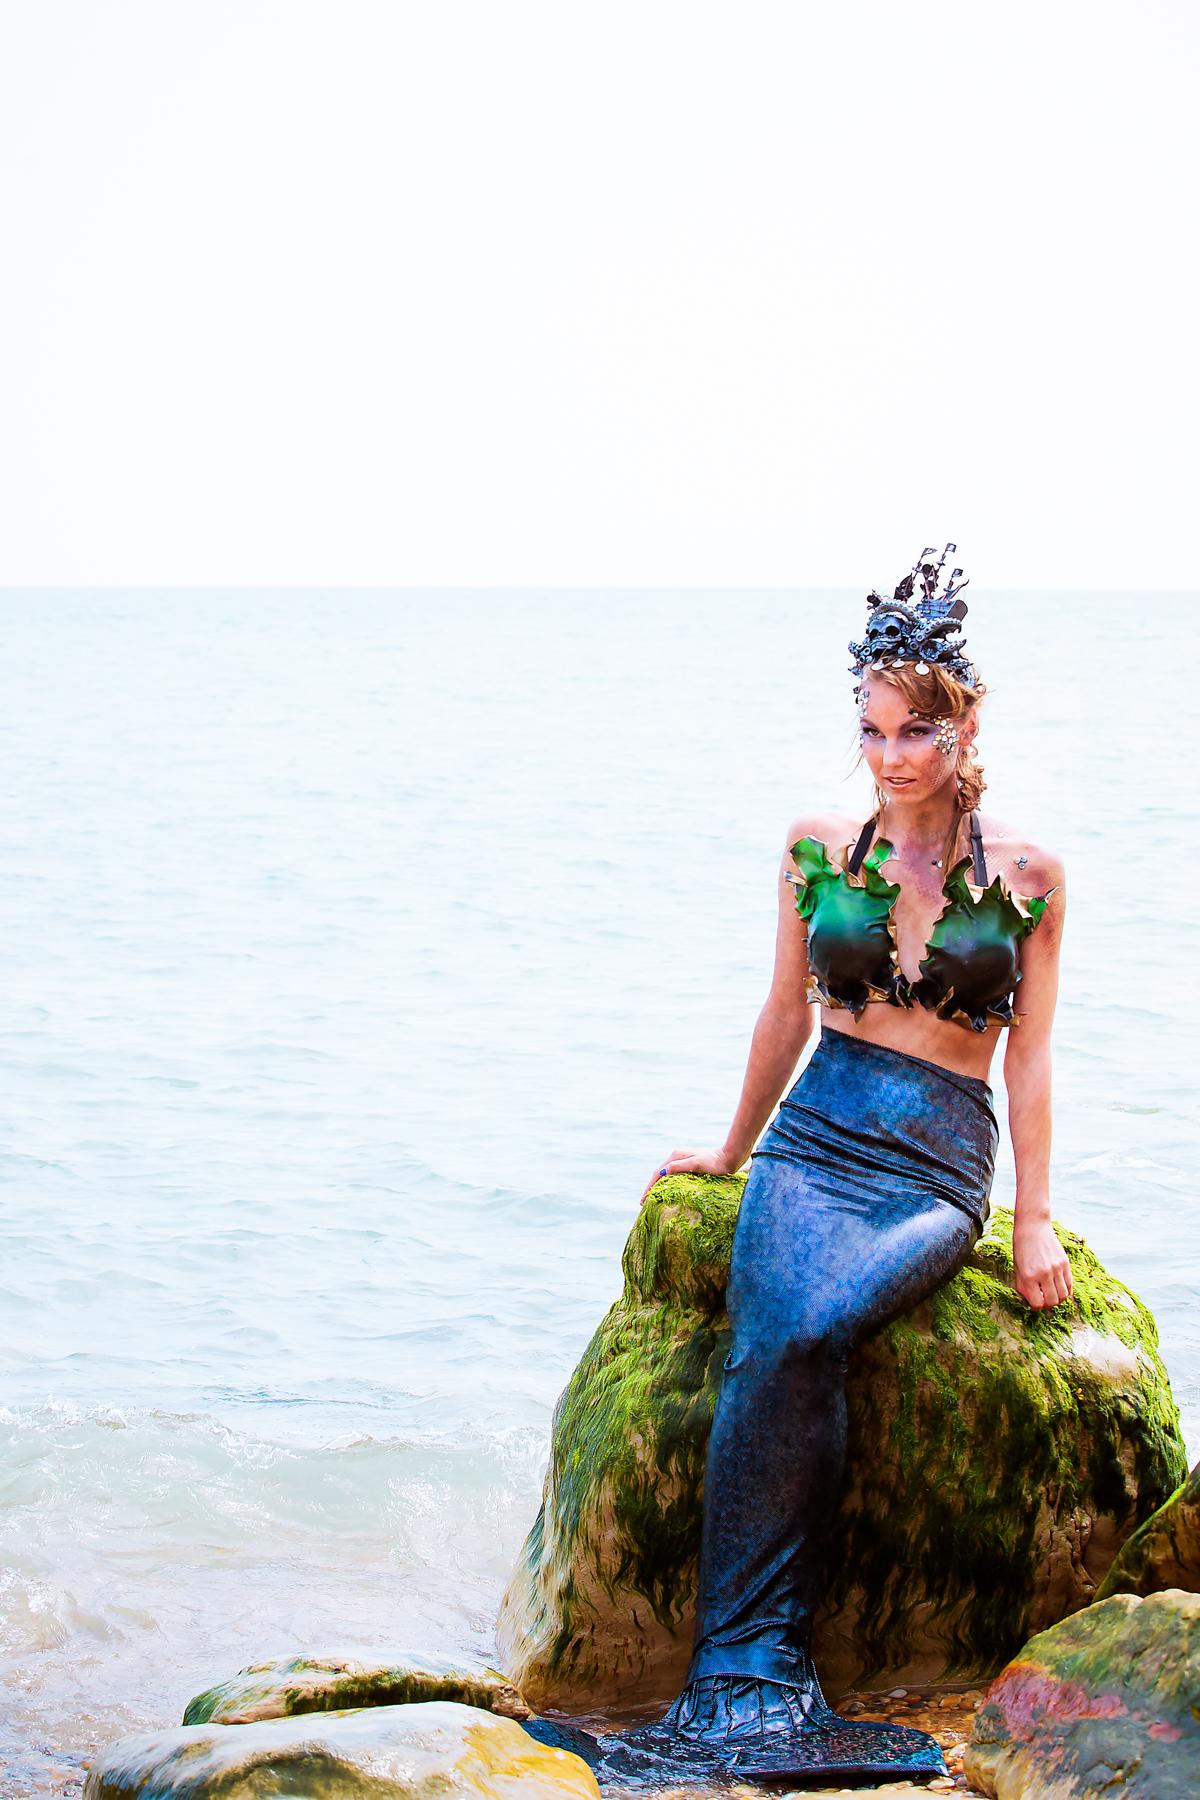 A mermaid in the sea